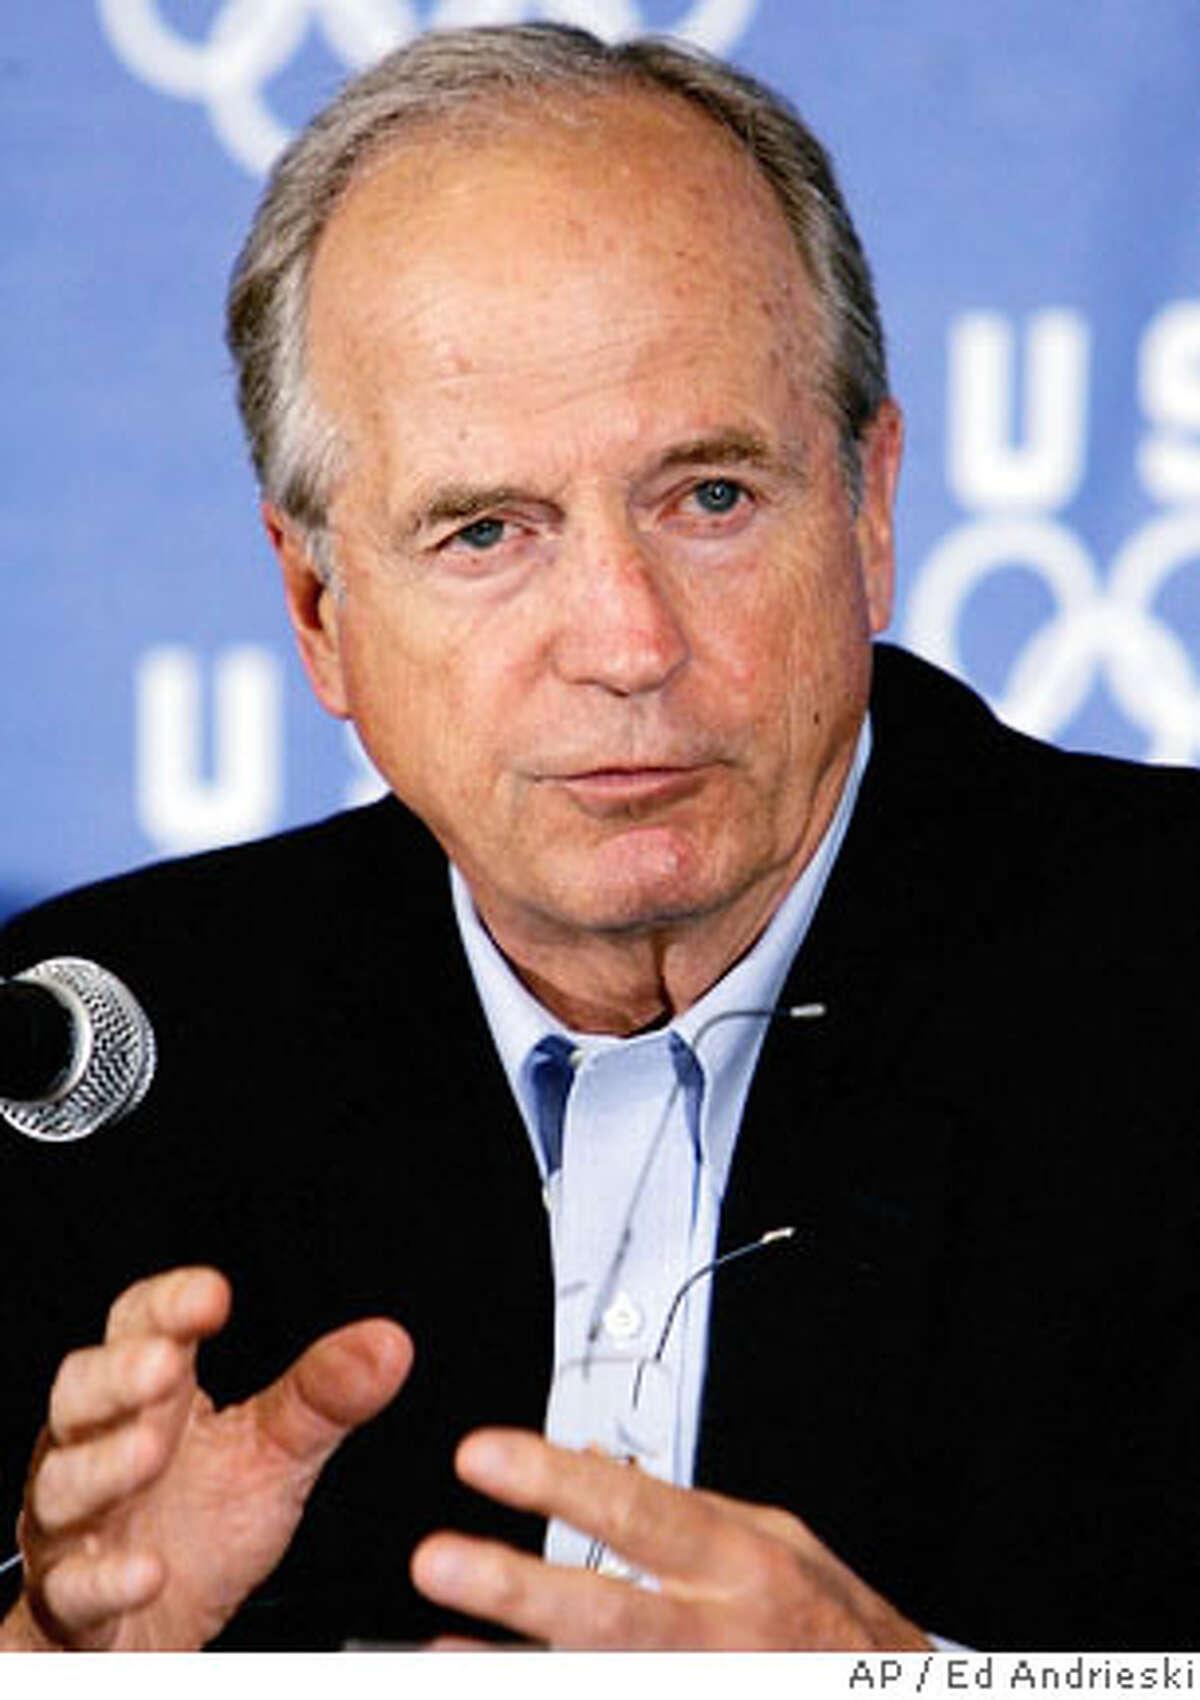 Peter Ueberroth